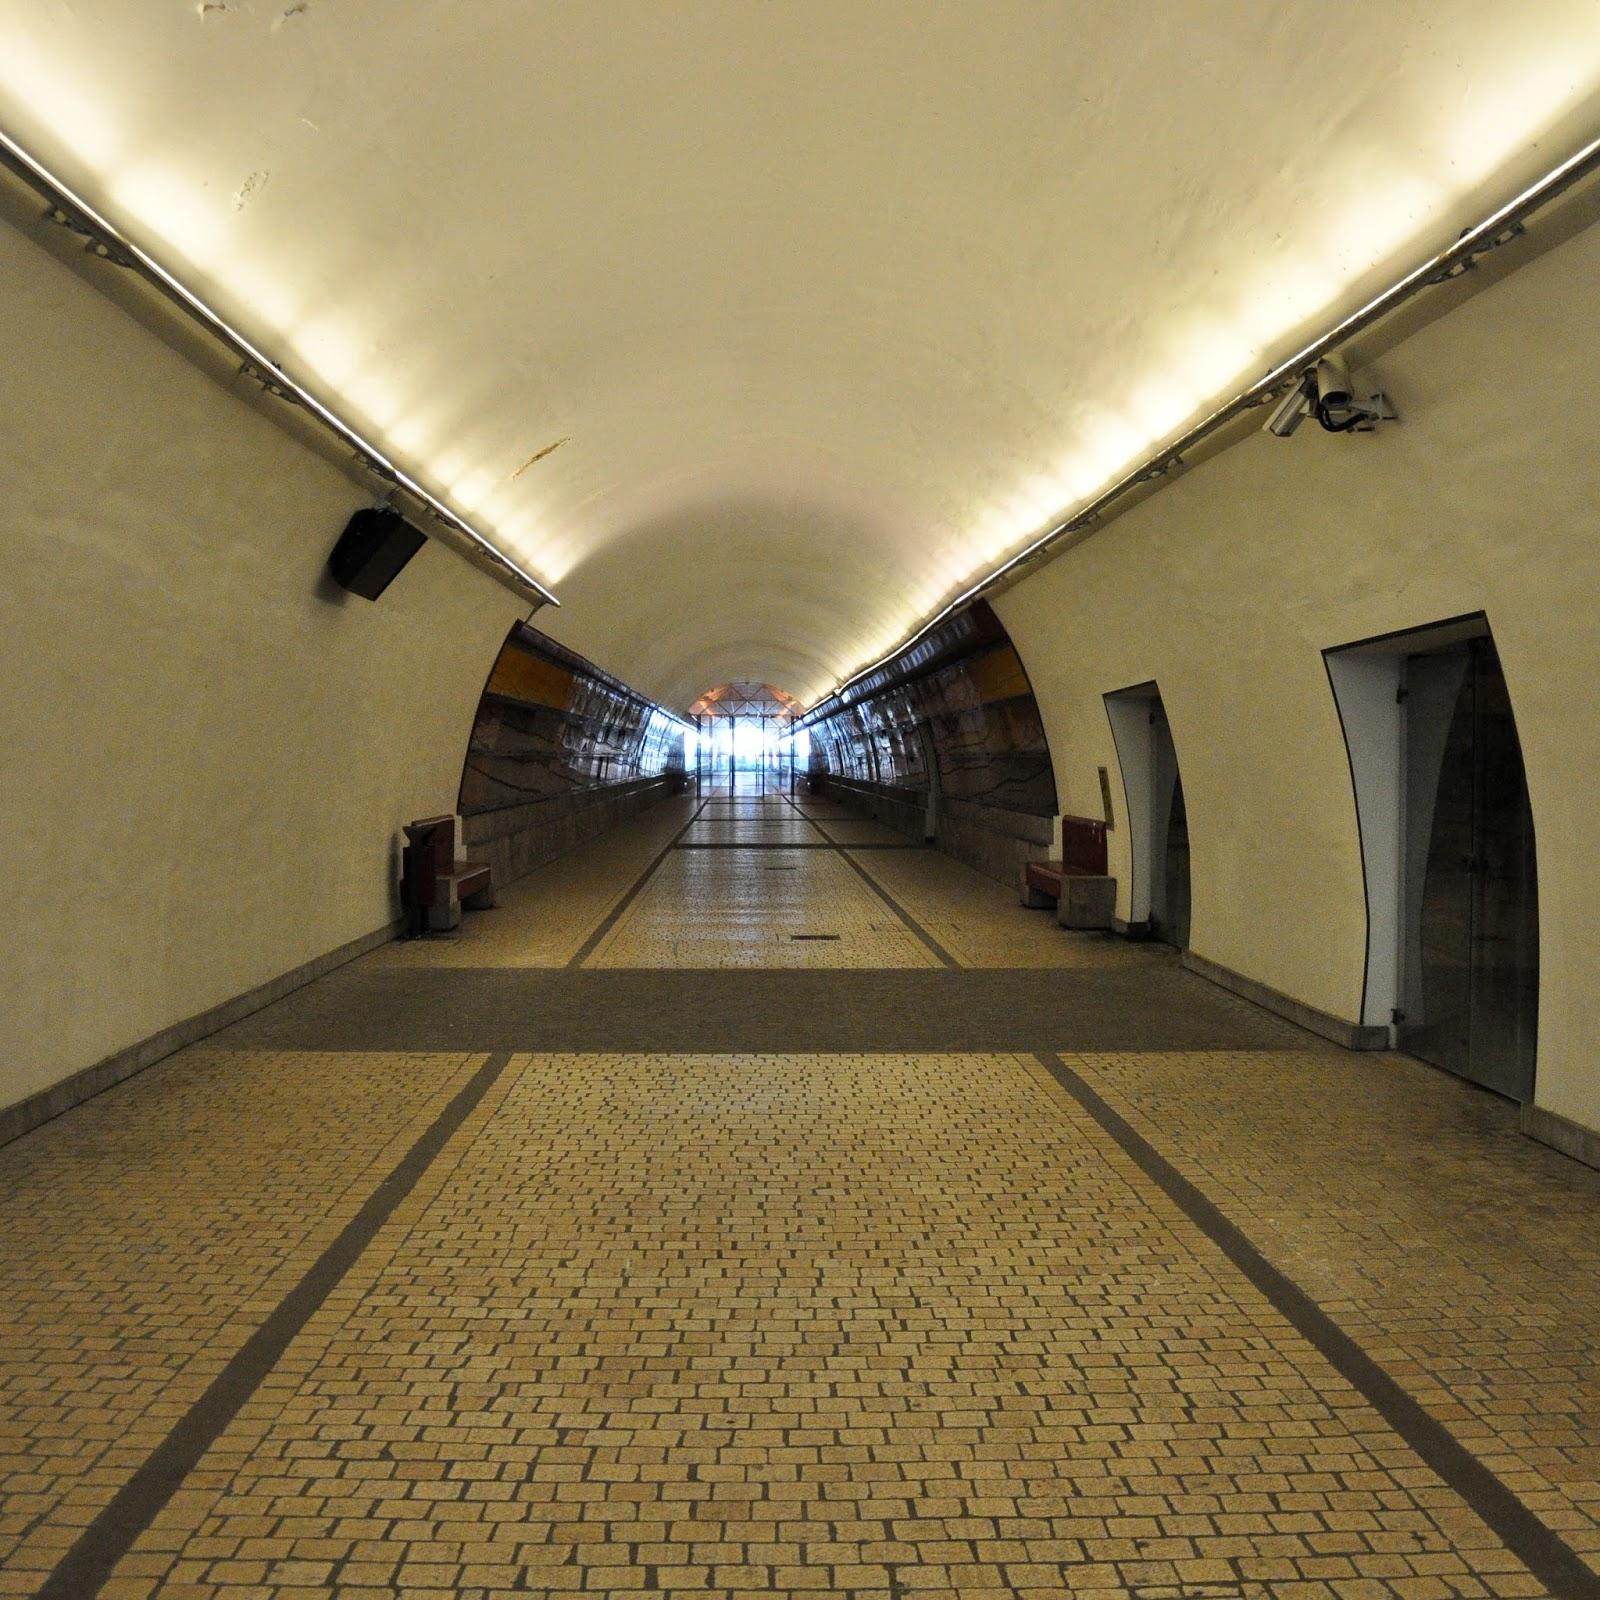 The tunnel running under the old city, Feltre, Veneto, Italy